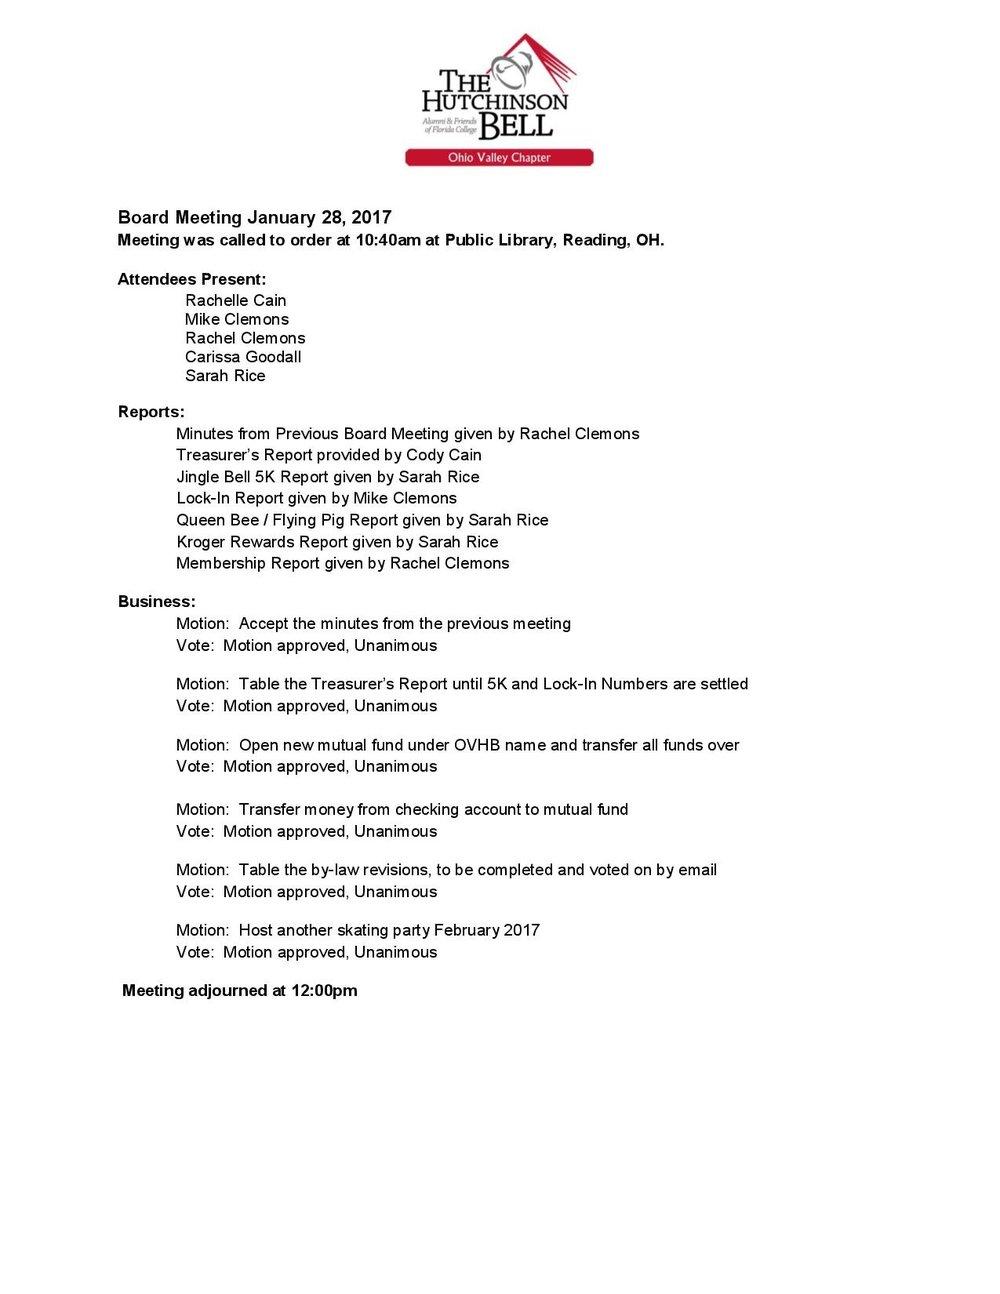 MinutesGeneralAssemblyMeetingJanuary282017-page-001.jpg